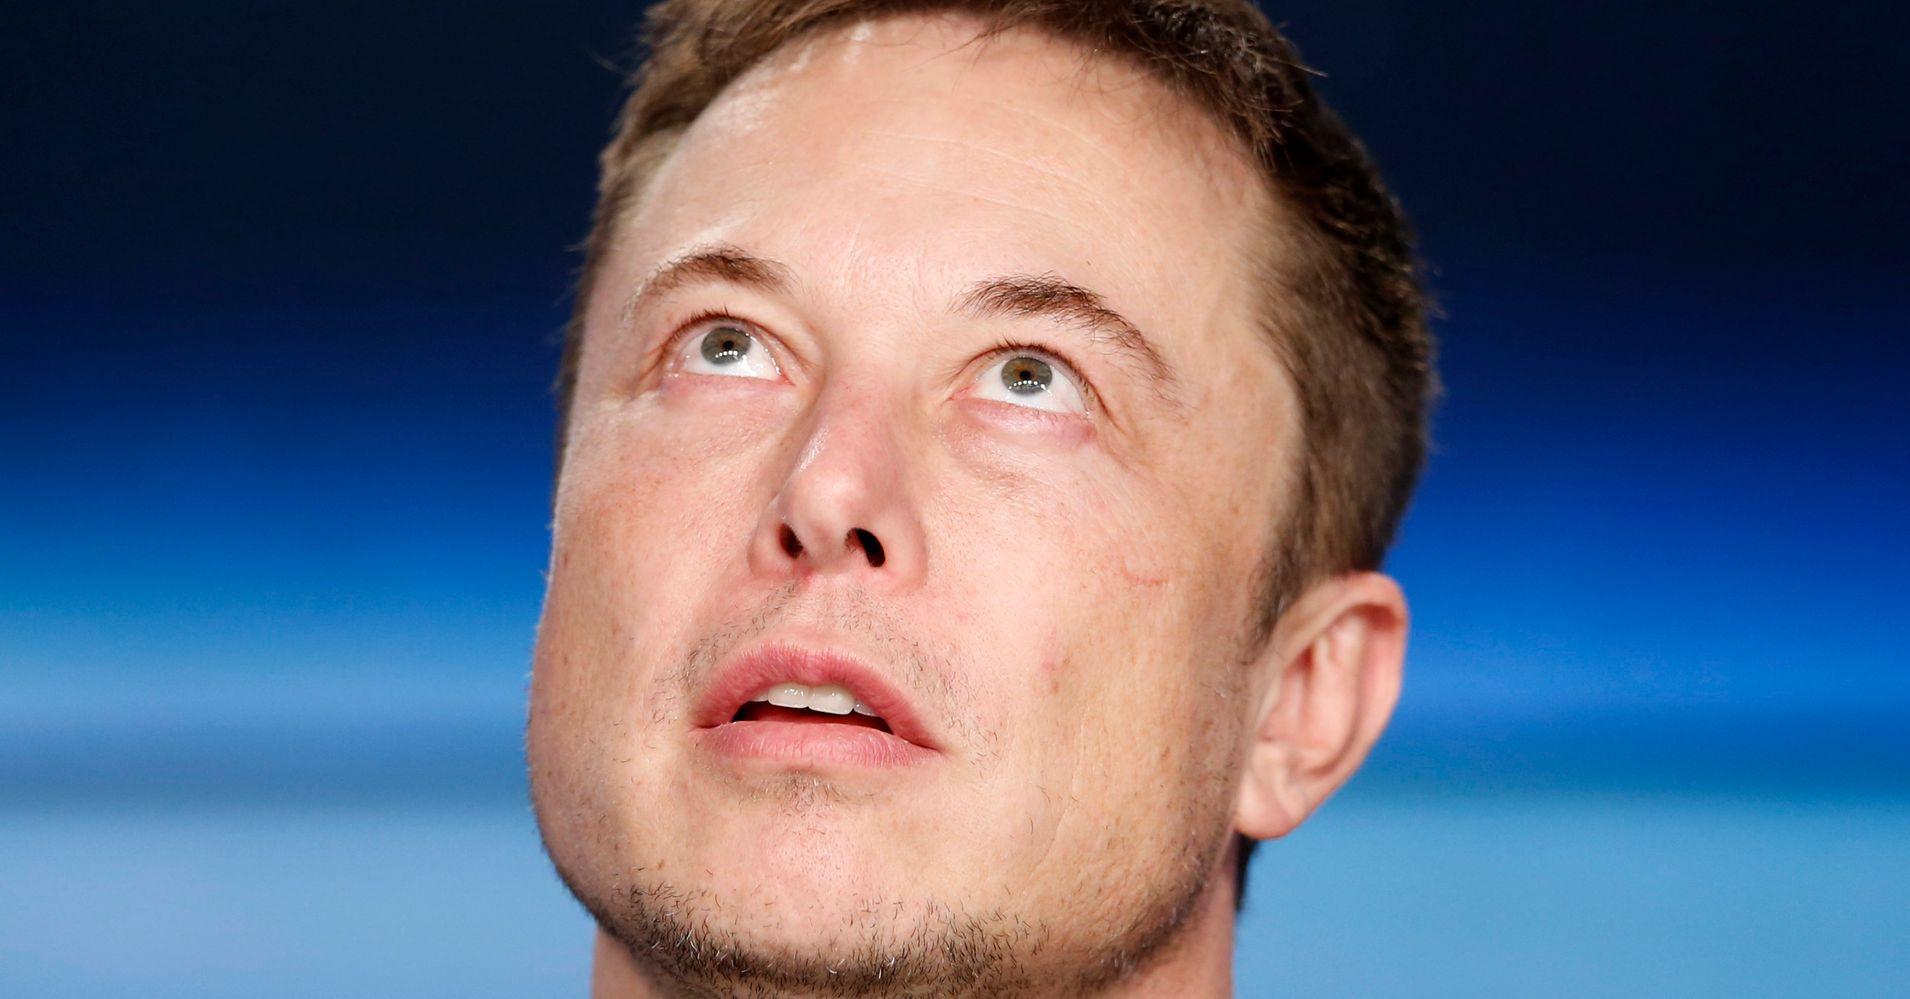 Elon Musk To Resign As Tesla Chairman In SEC Settlement